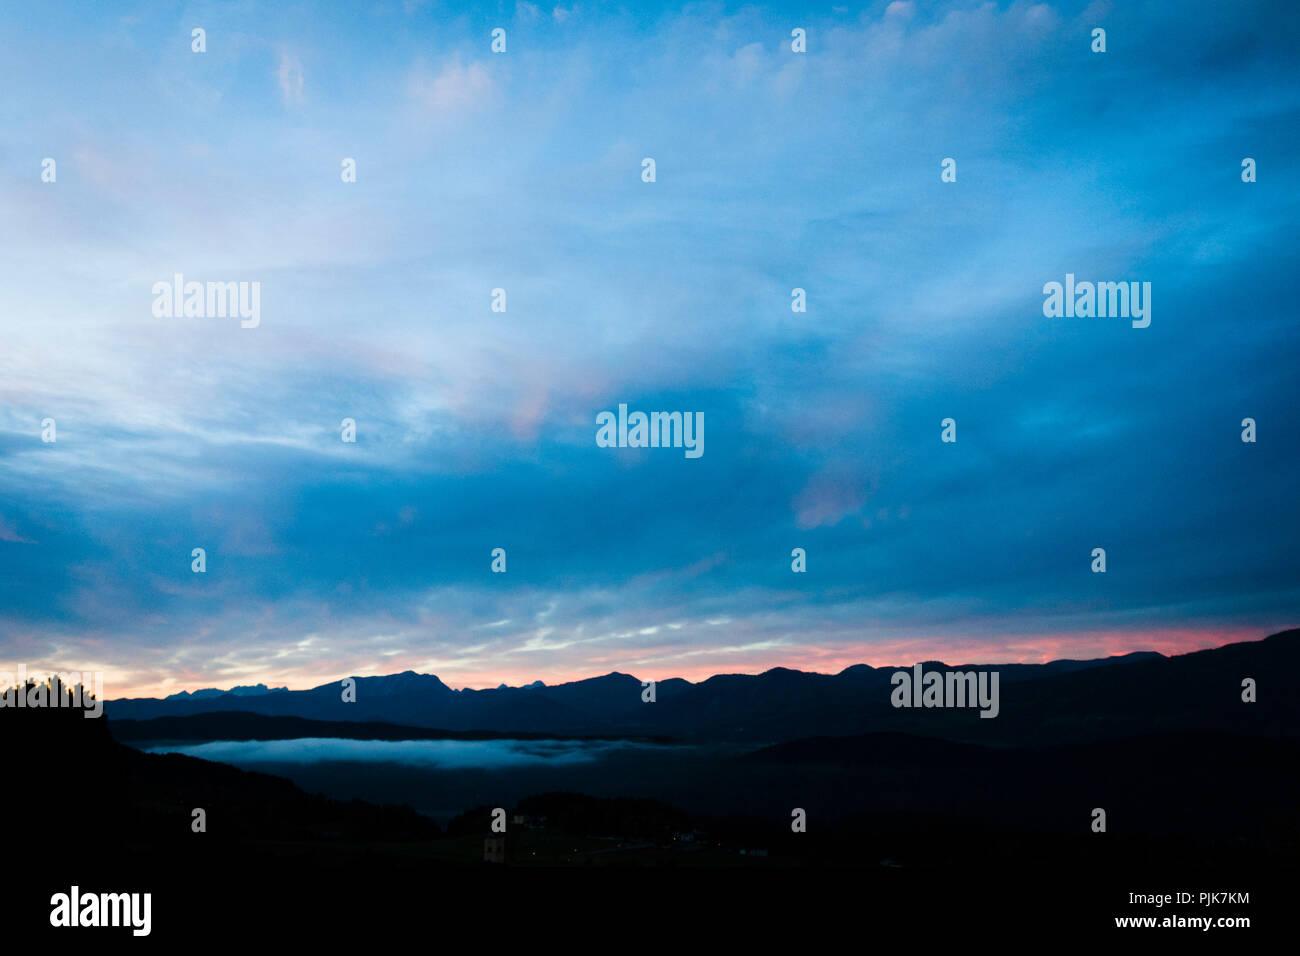 Evening, Obermillstatt, Lake Millstatt, Carinthia, Austria - Stock Image